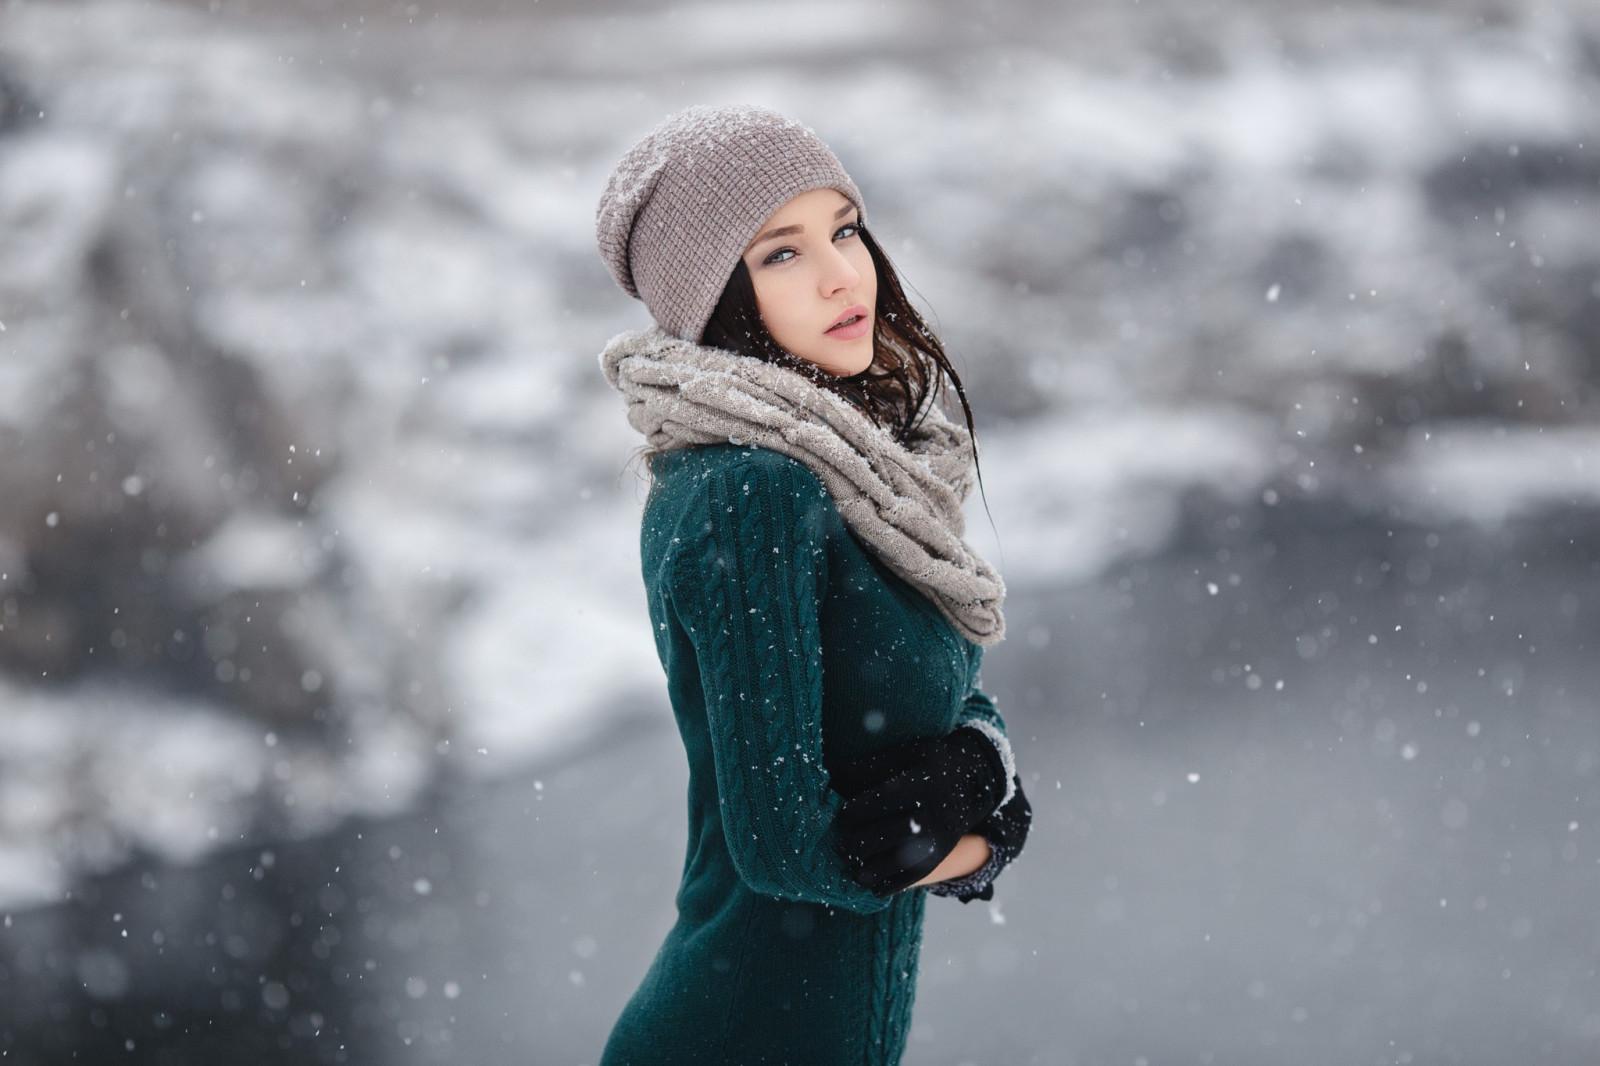 брюнетки под снегом фото фото материалы сайте